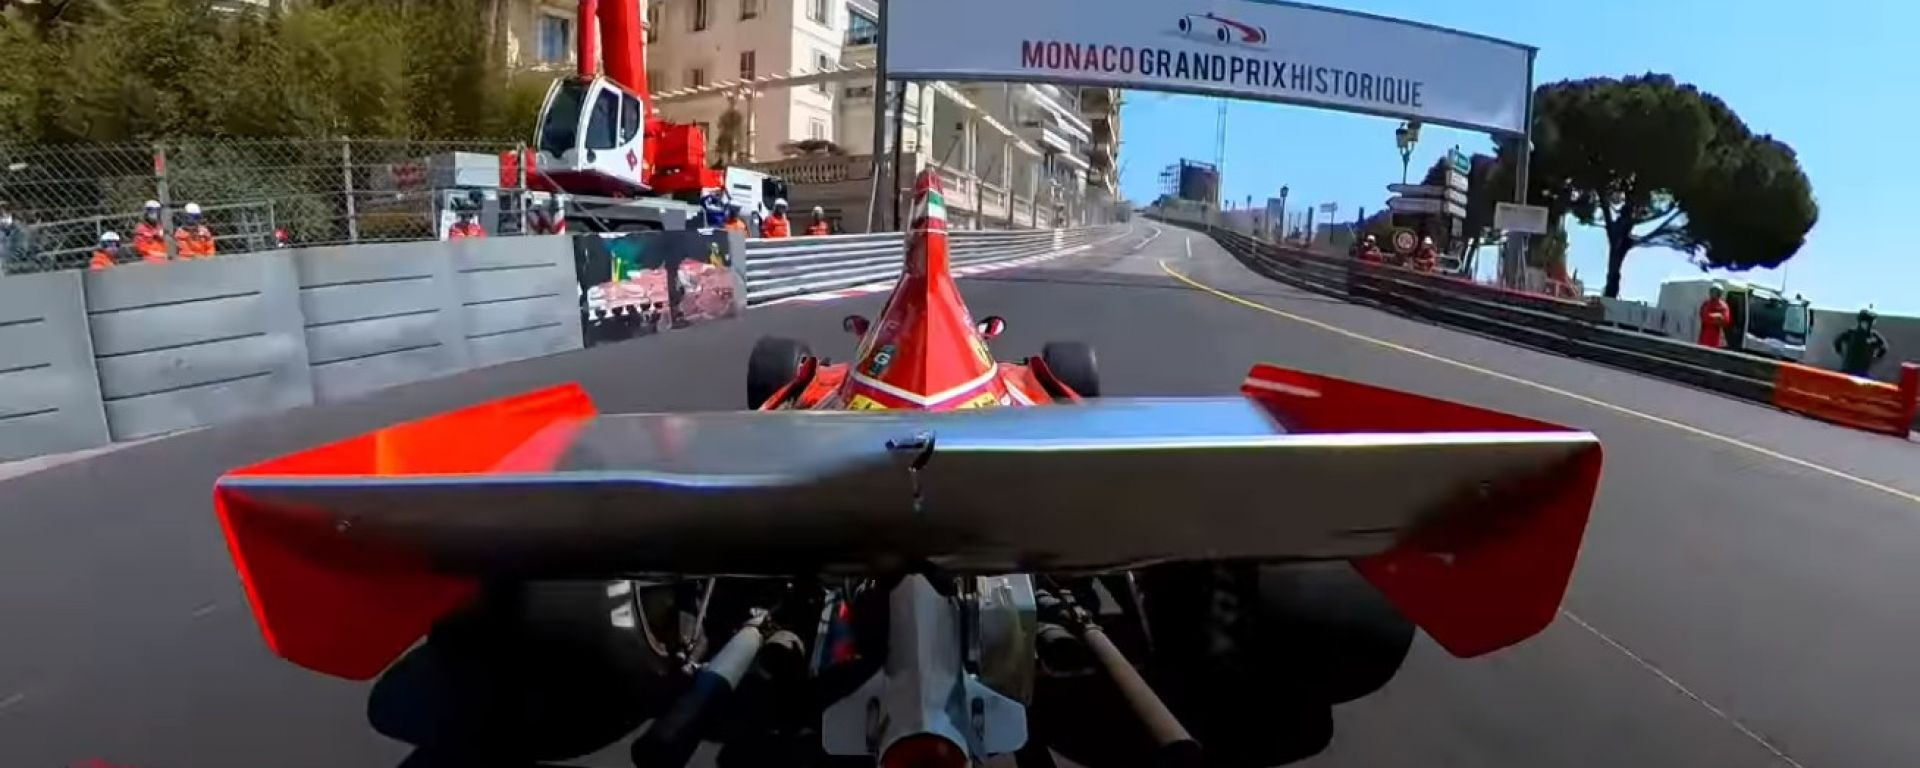 GP Monaco Historique 2021: onboard camera Ferrari 312B3 1974